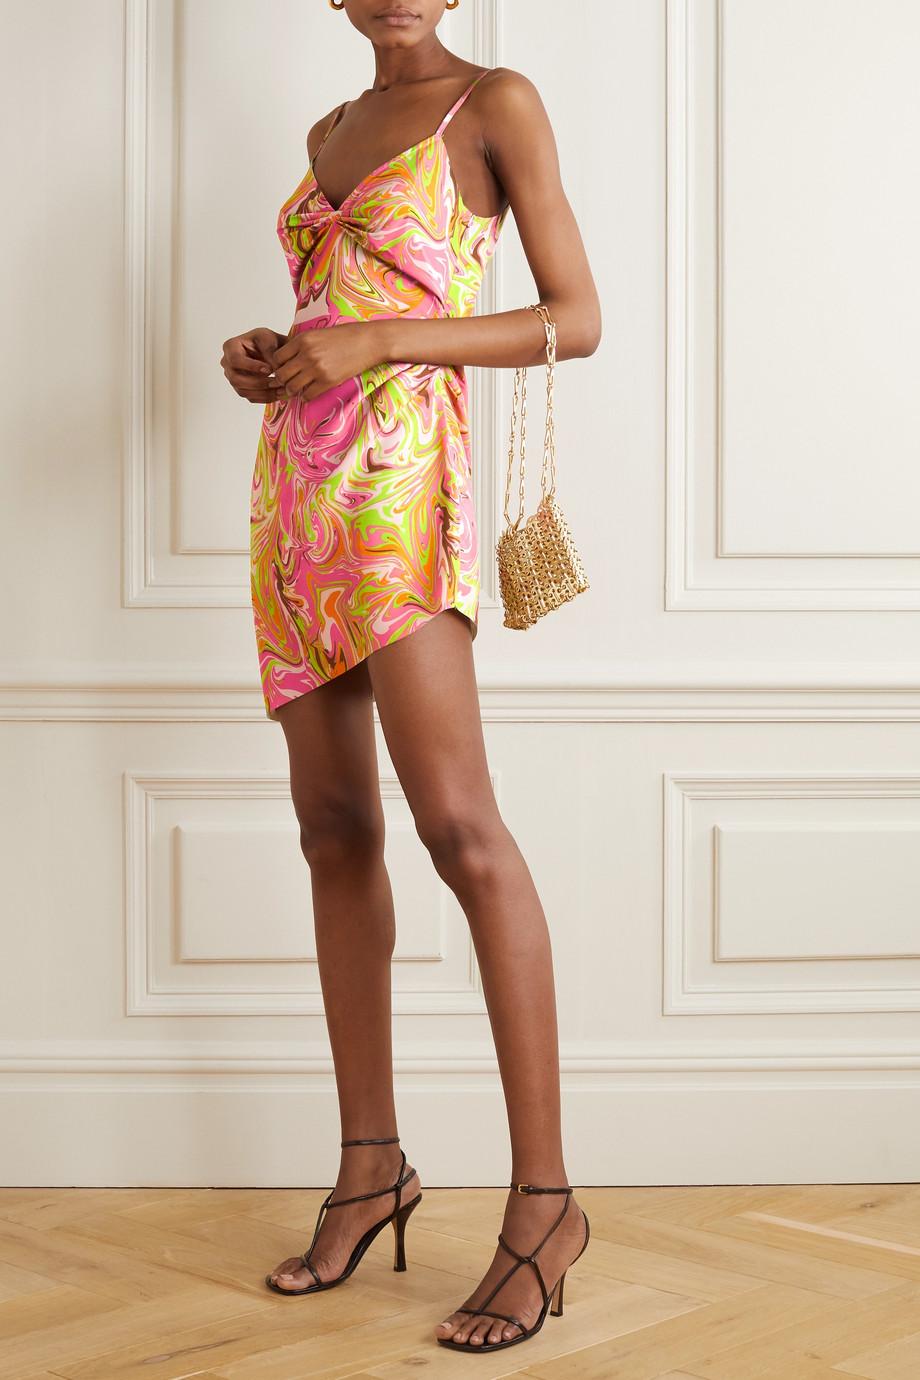 Maisie Wilen Party Girl asymmetric printed crepe mini dress